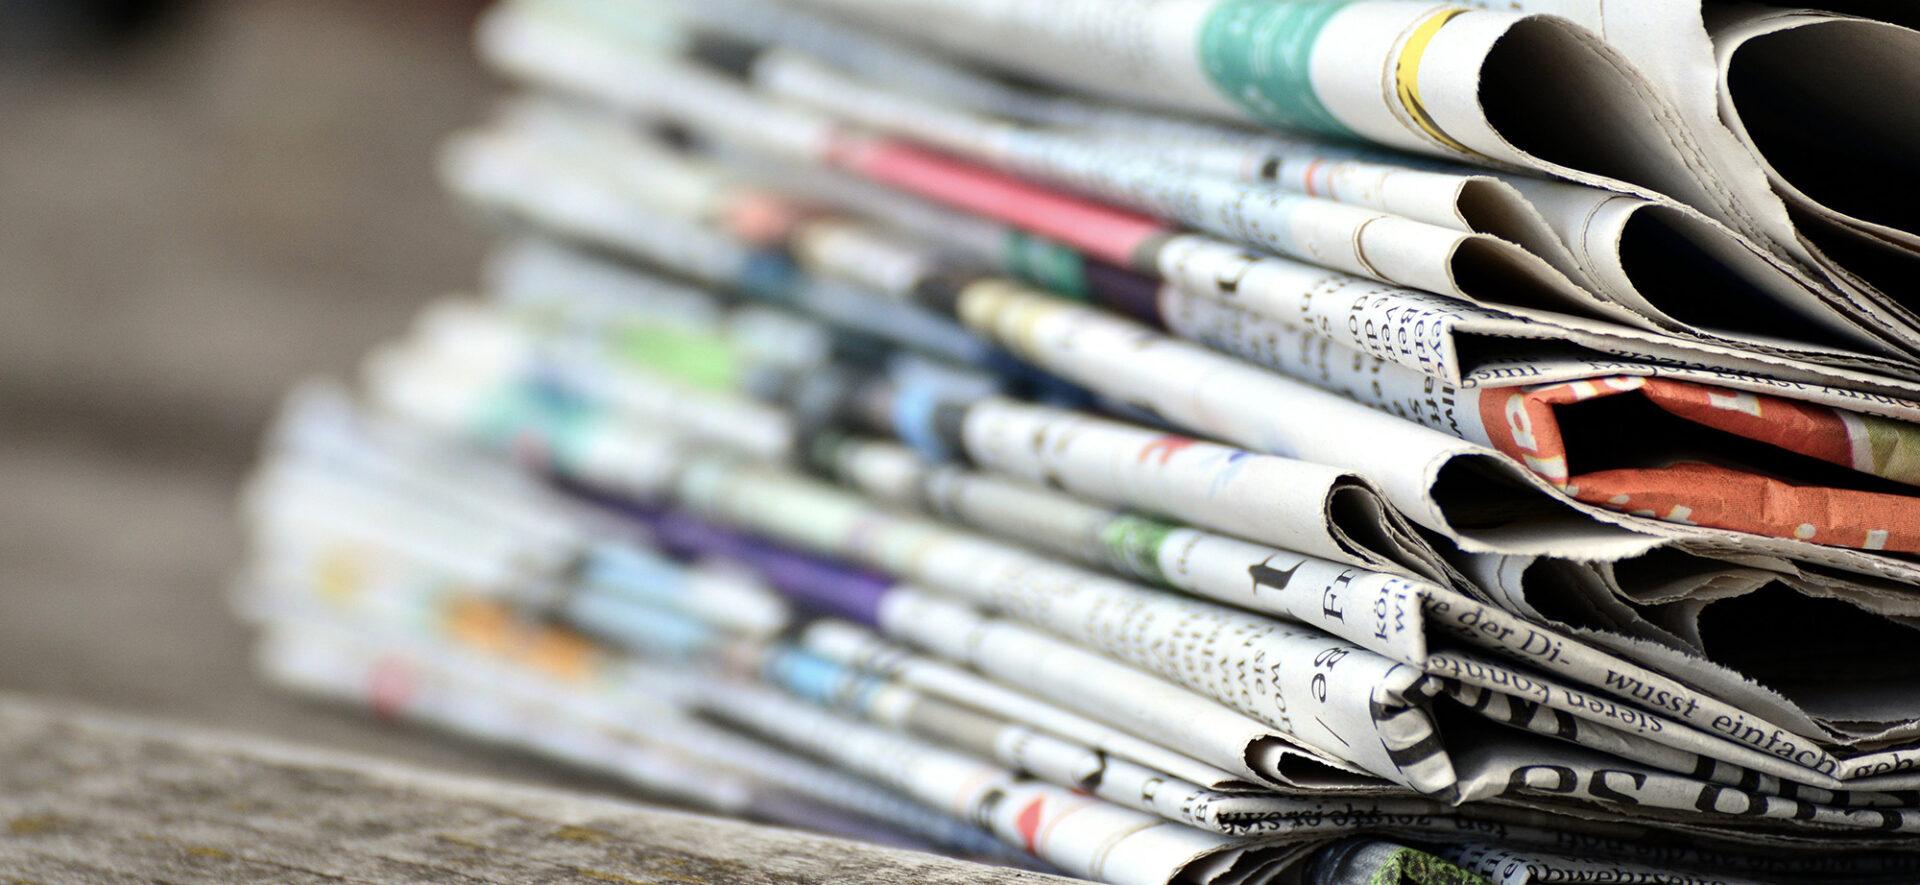 Journaux magazines